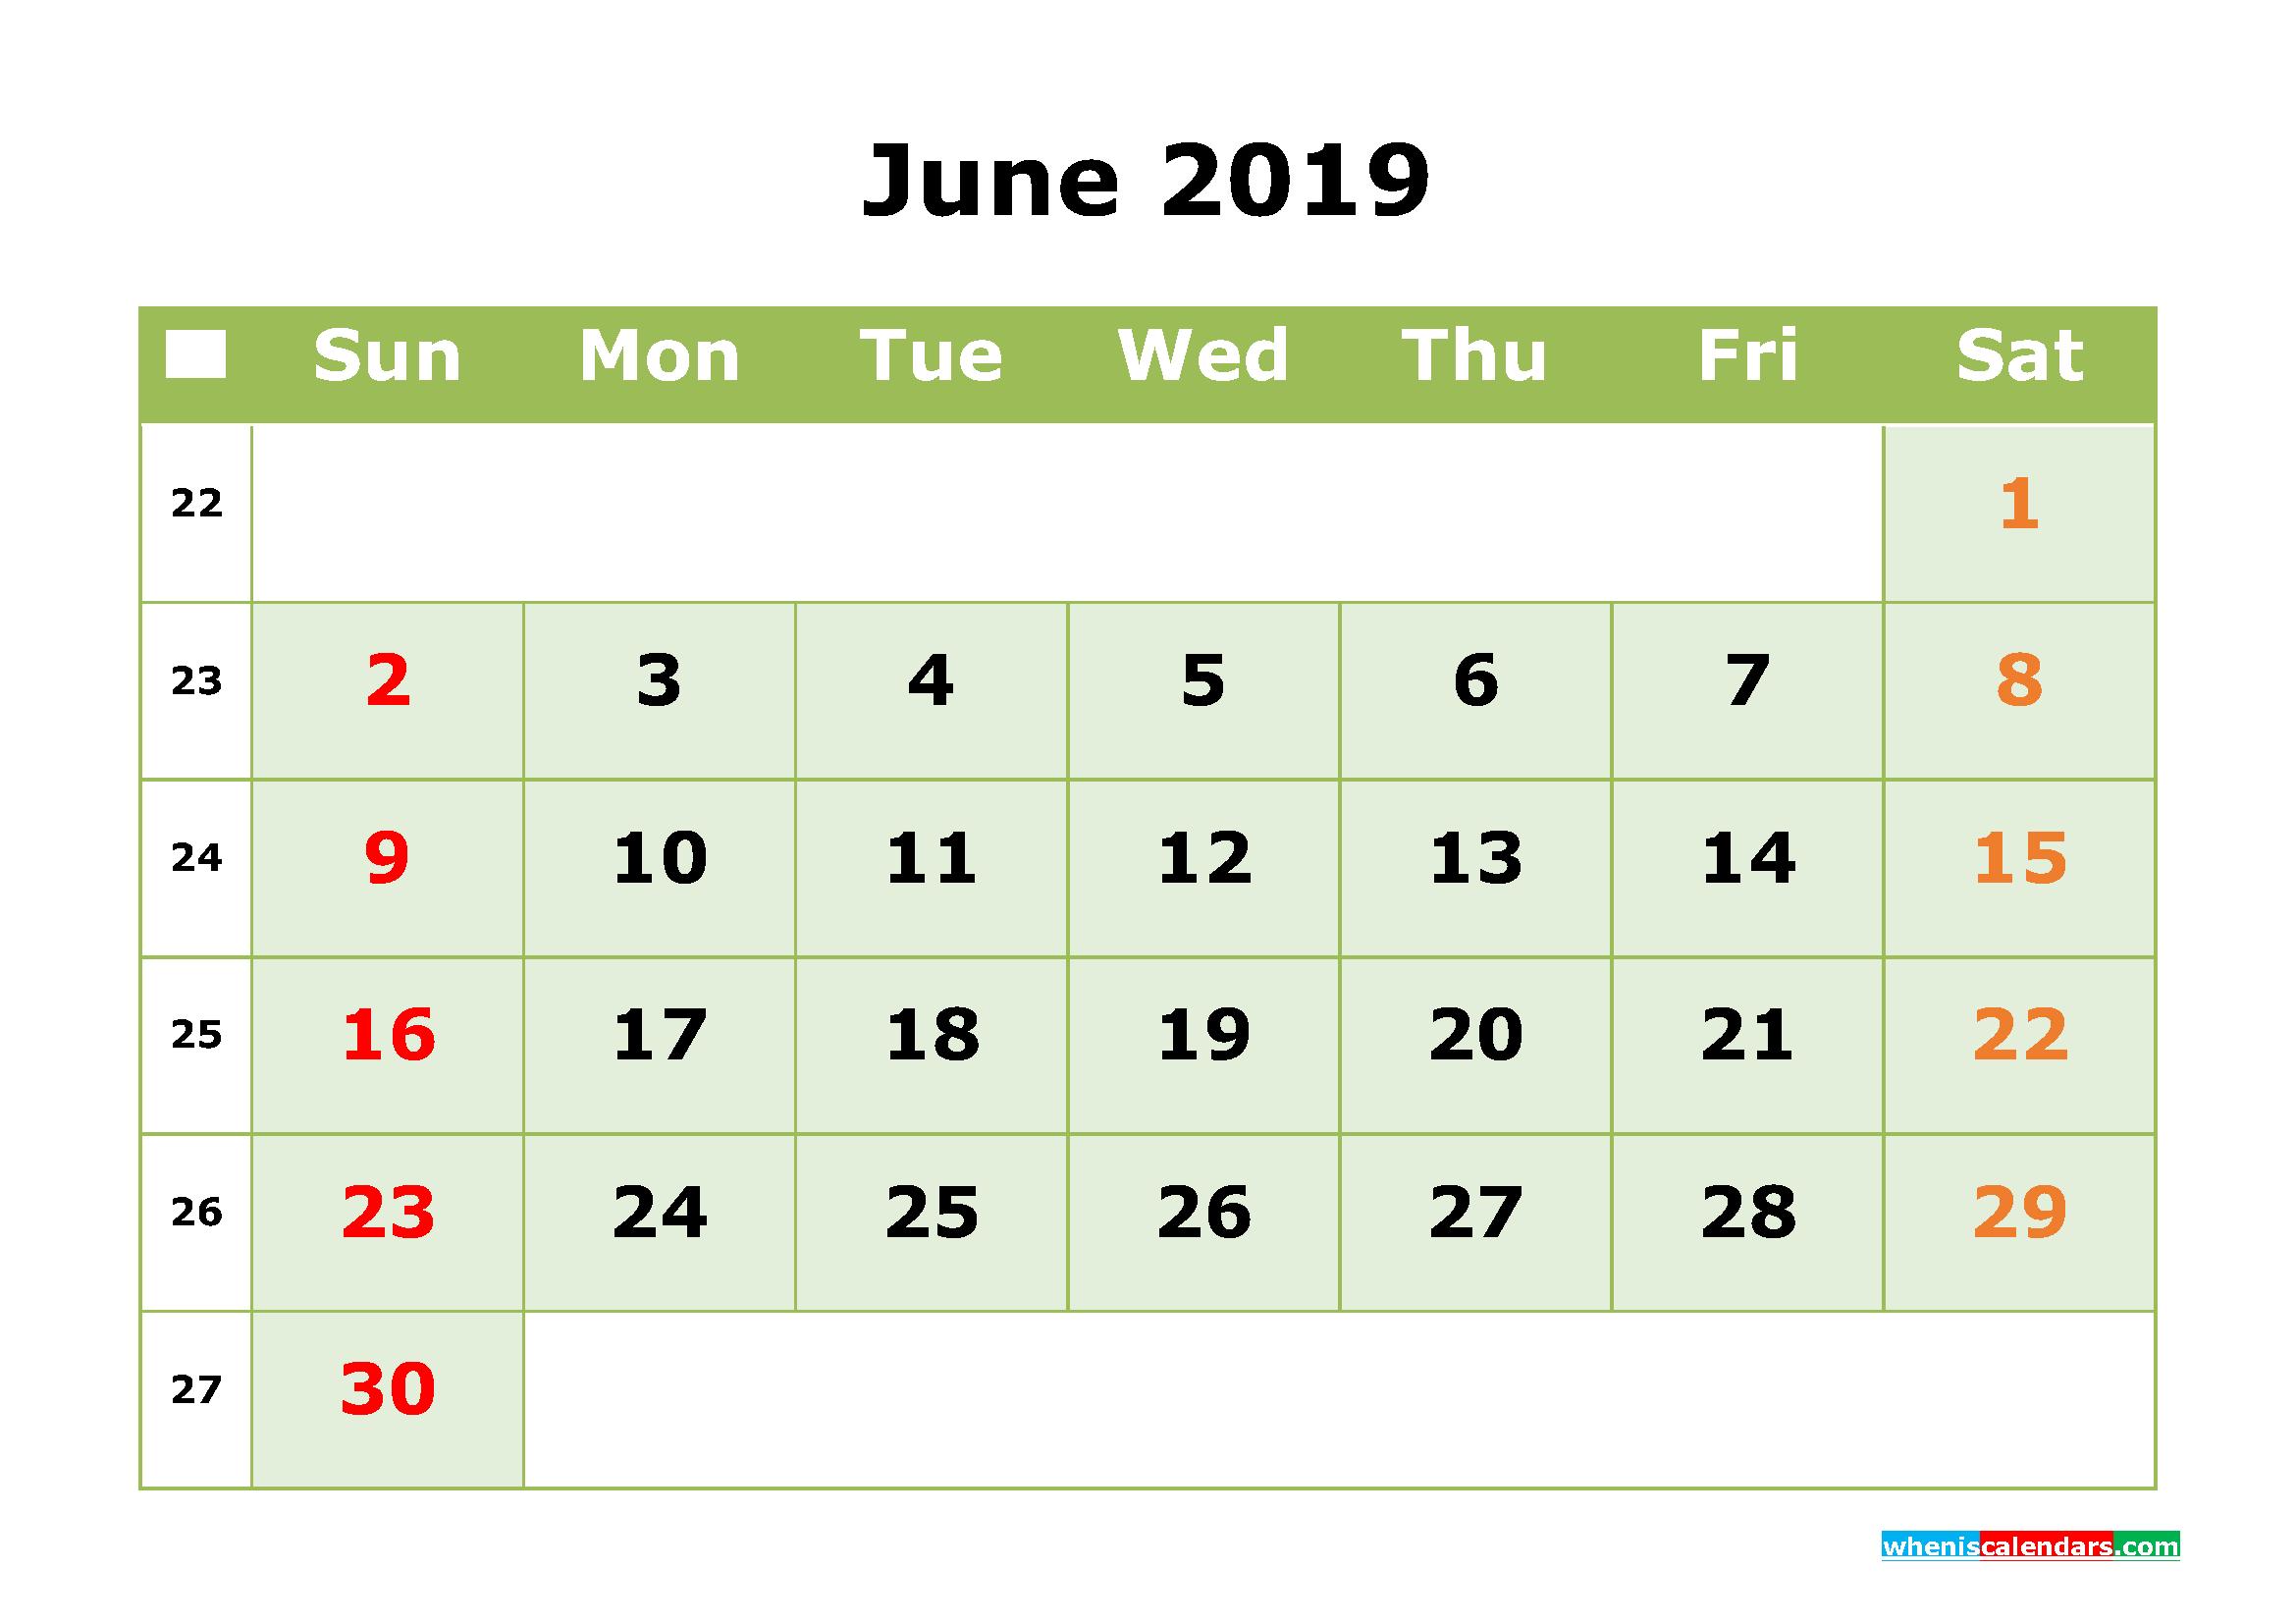 June 2019 Printable Calendar Month by Month Calendar Template